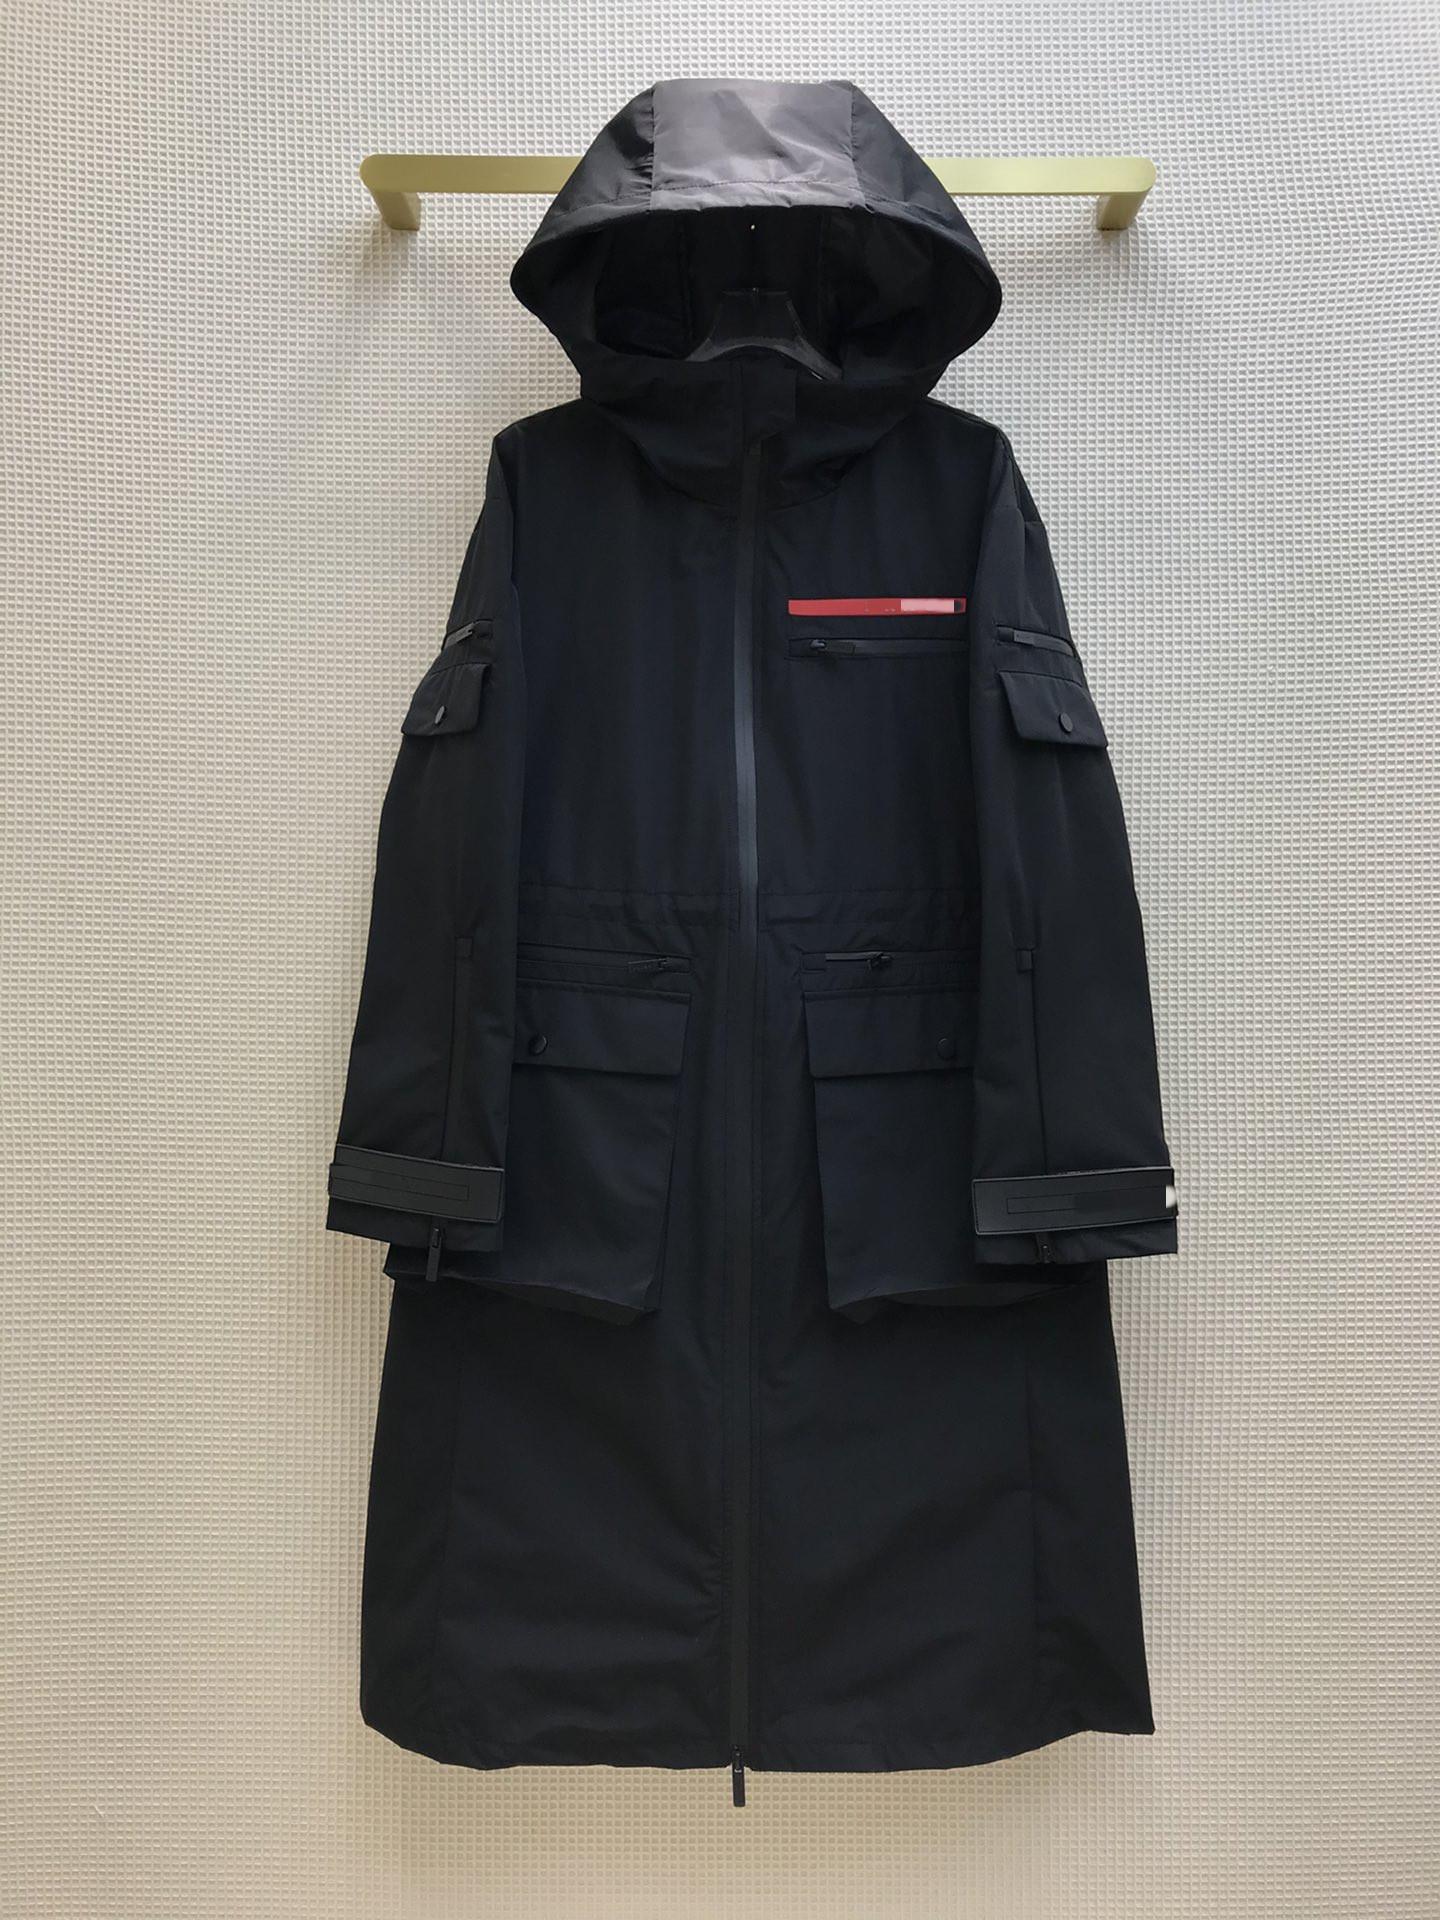 Milan Runway Coats 2021 Hooded Long Sleeve Women's coats Designer Coats Brand Same Style Jackets 0301-7